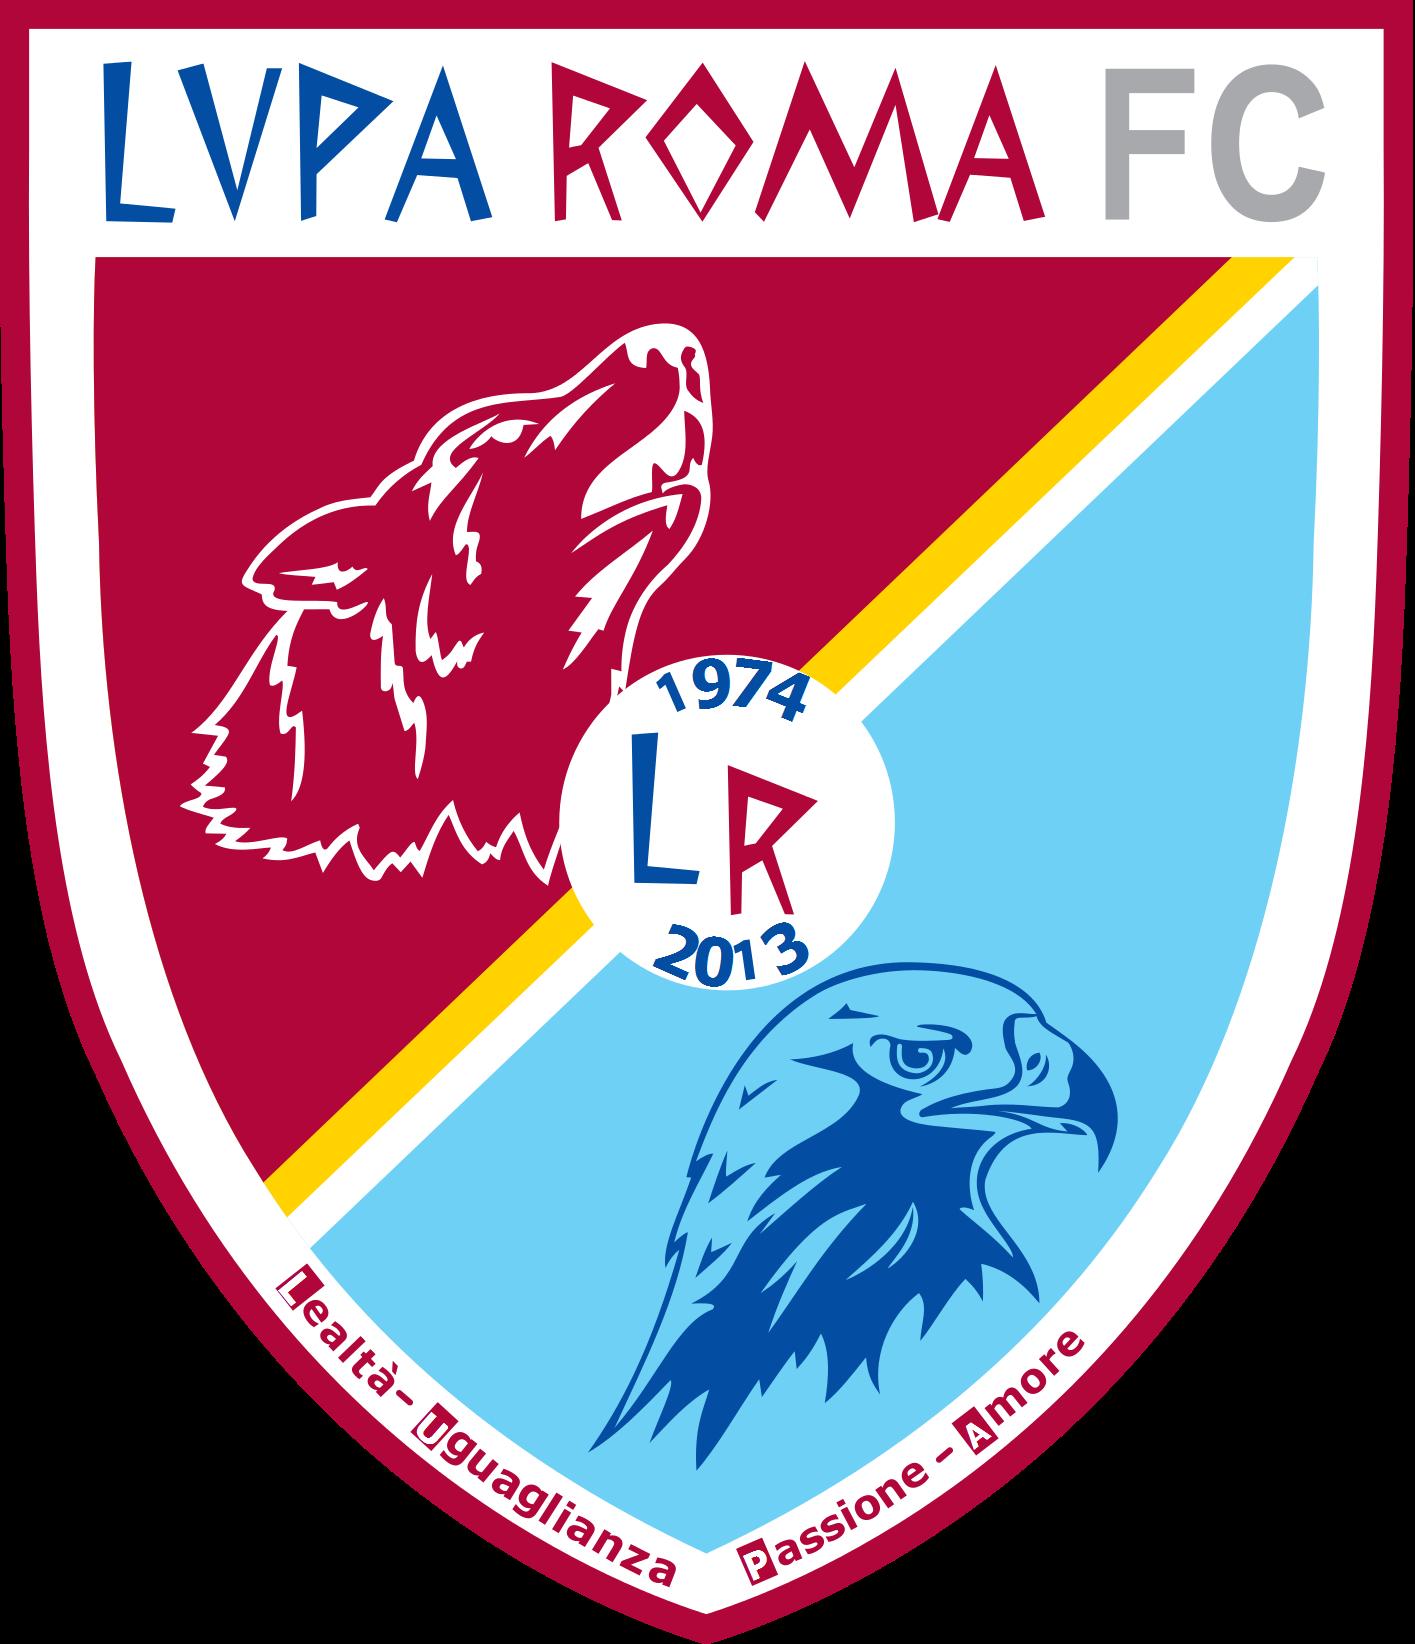 20160127233255!Logo_Lupa_Roma_FC_1974-20